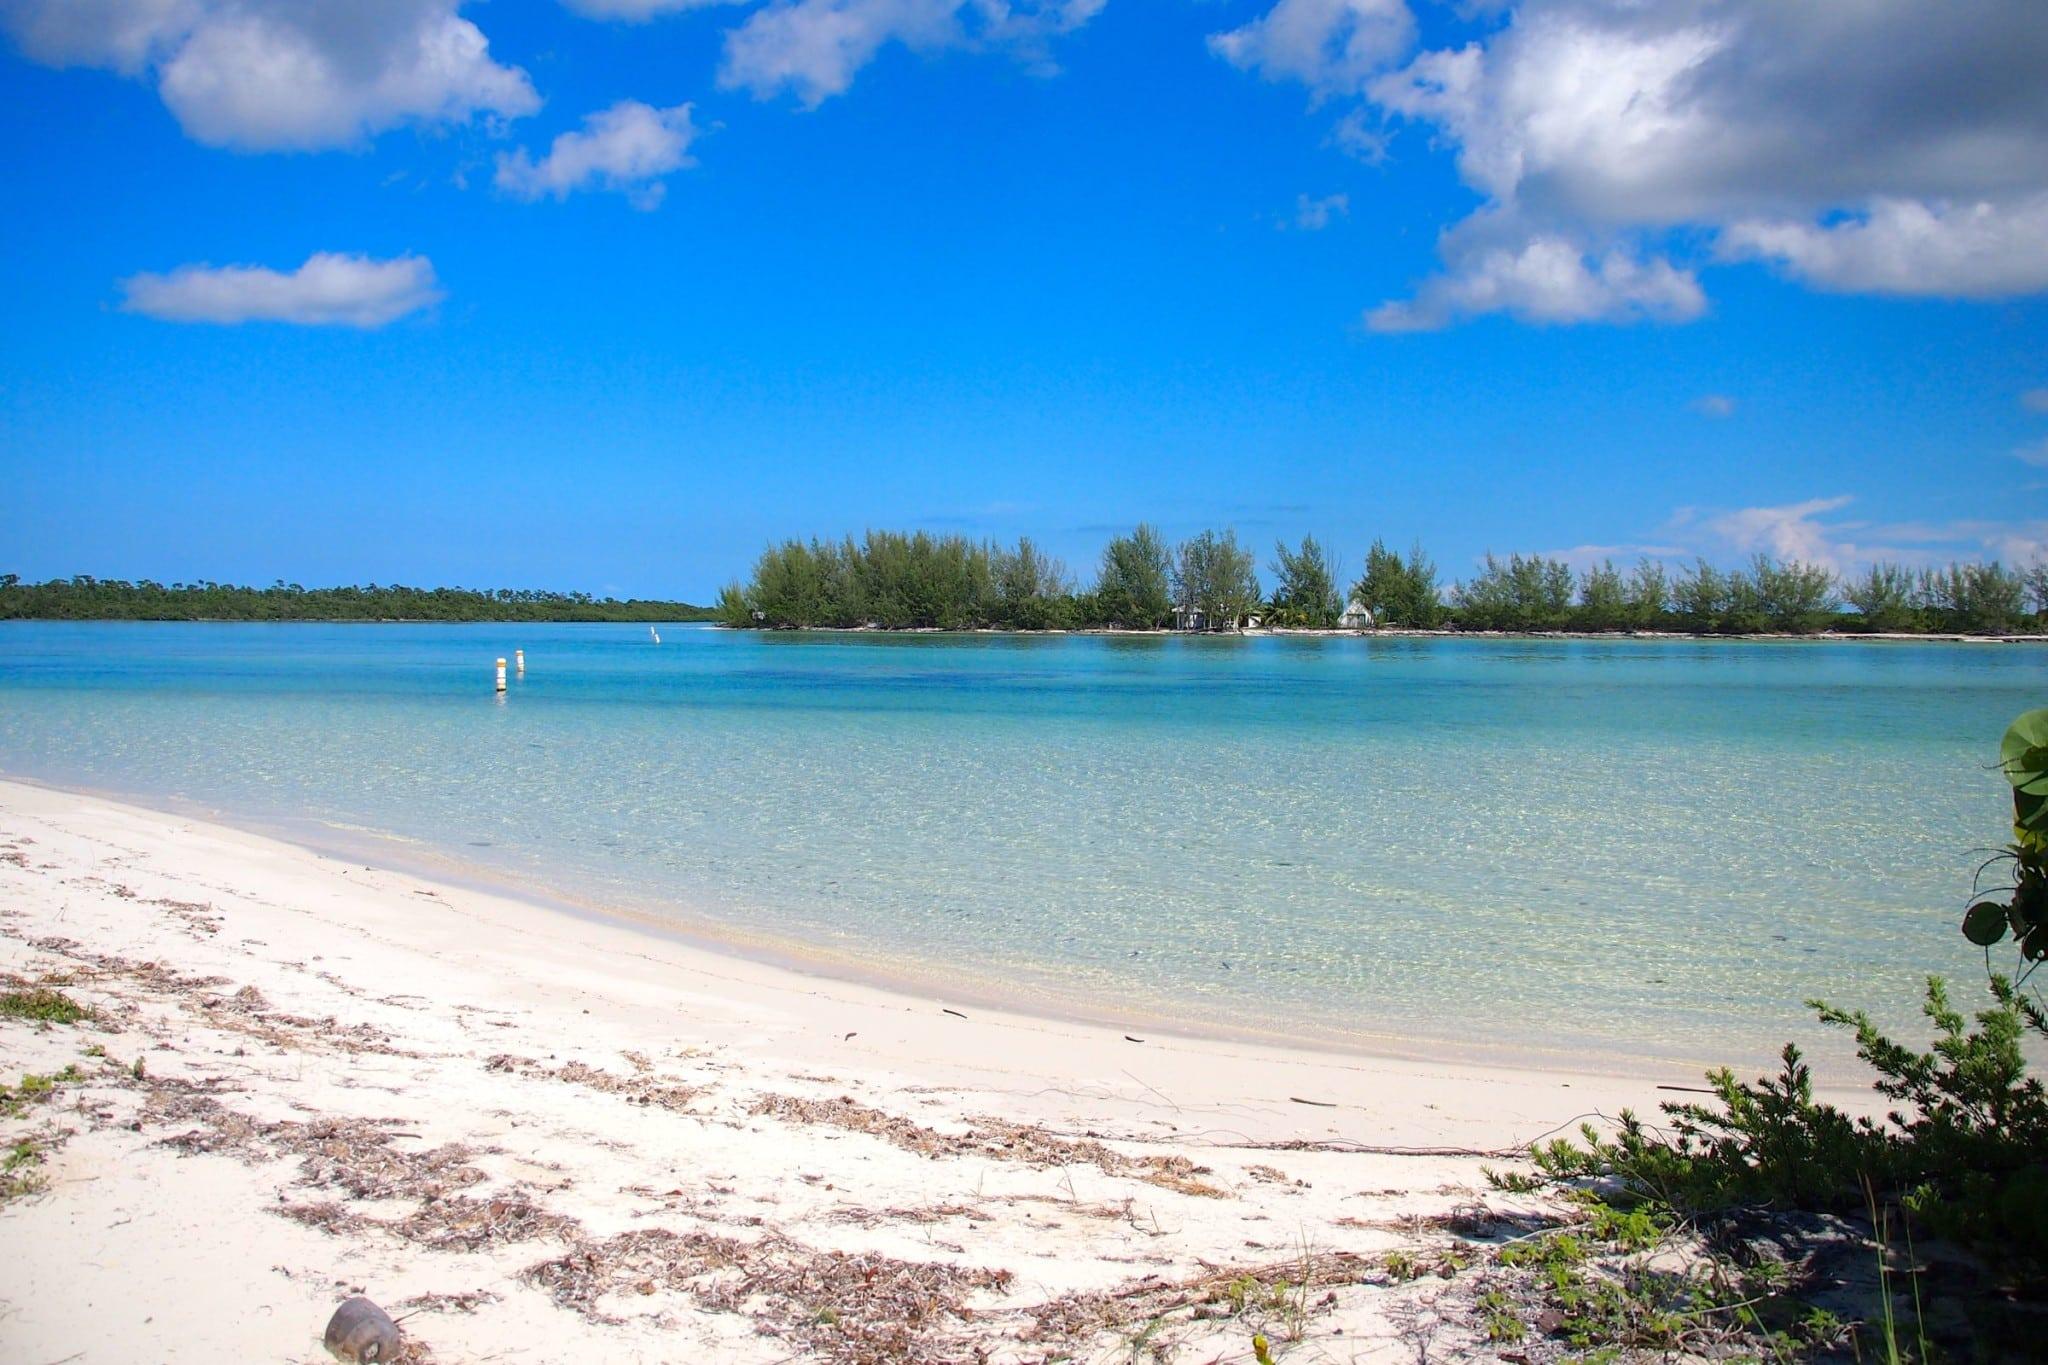 Sweetings Cay, The Bahamas: Uncommon Envy